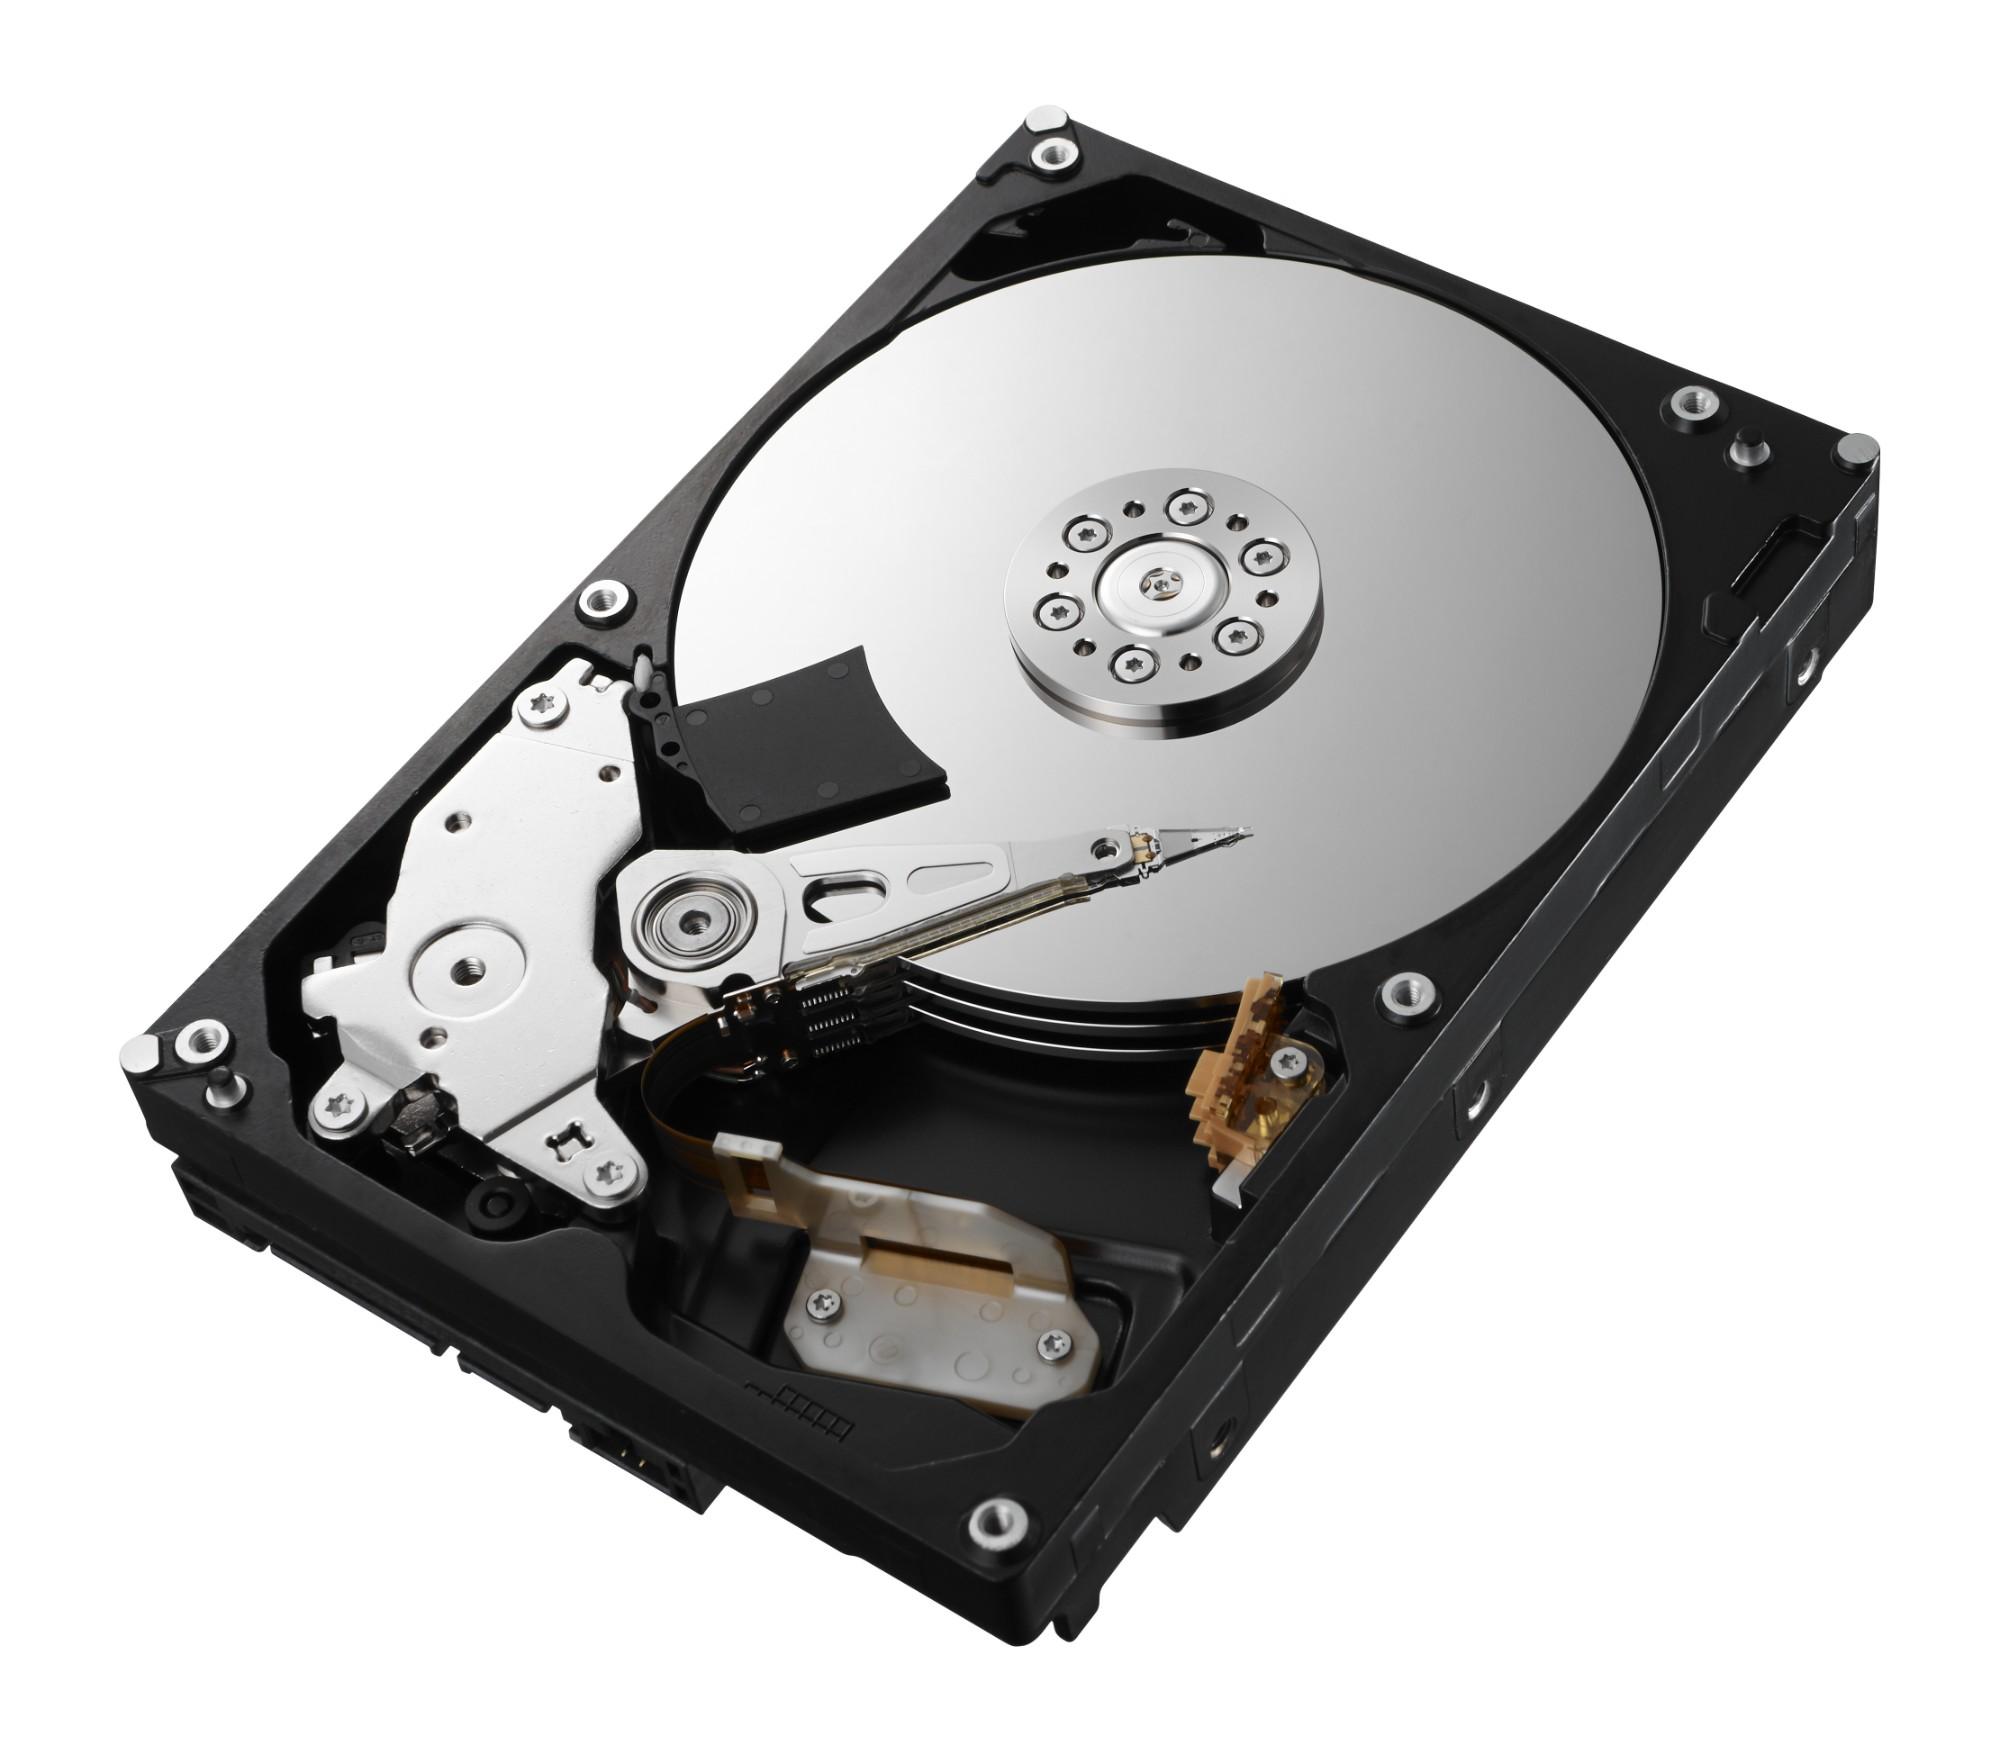 Toshiba P300 1tb Internal Hard Drive Hdd 1000 Gb Hardisk Pc 35 1000gb Serial Ata Iii